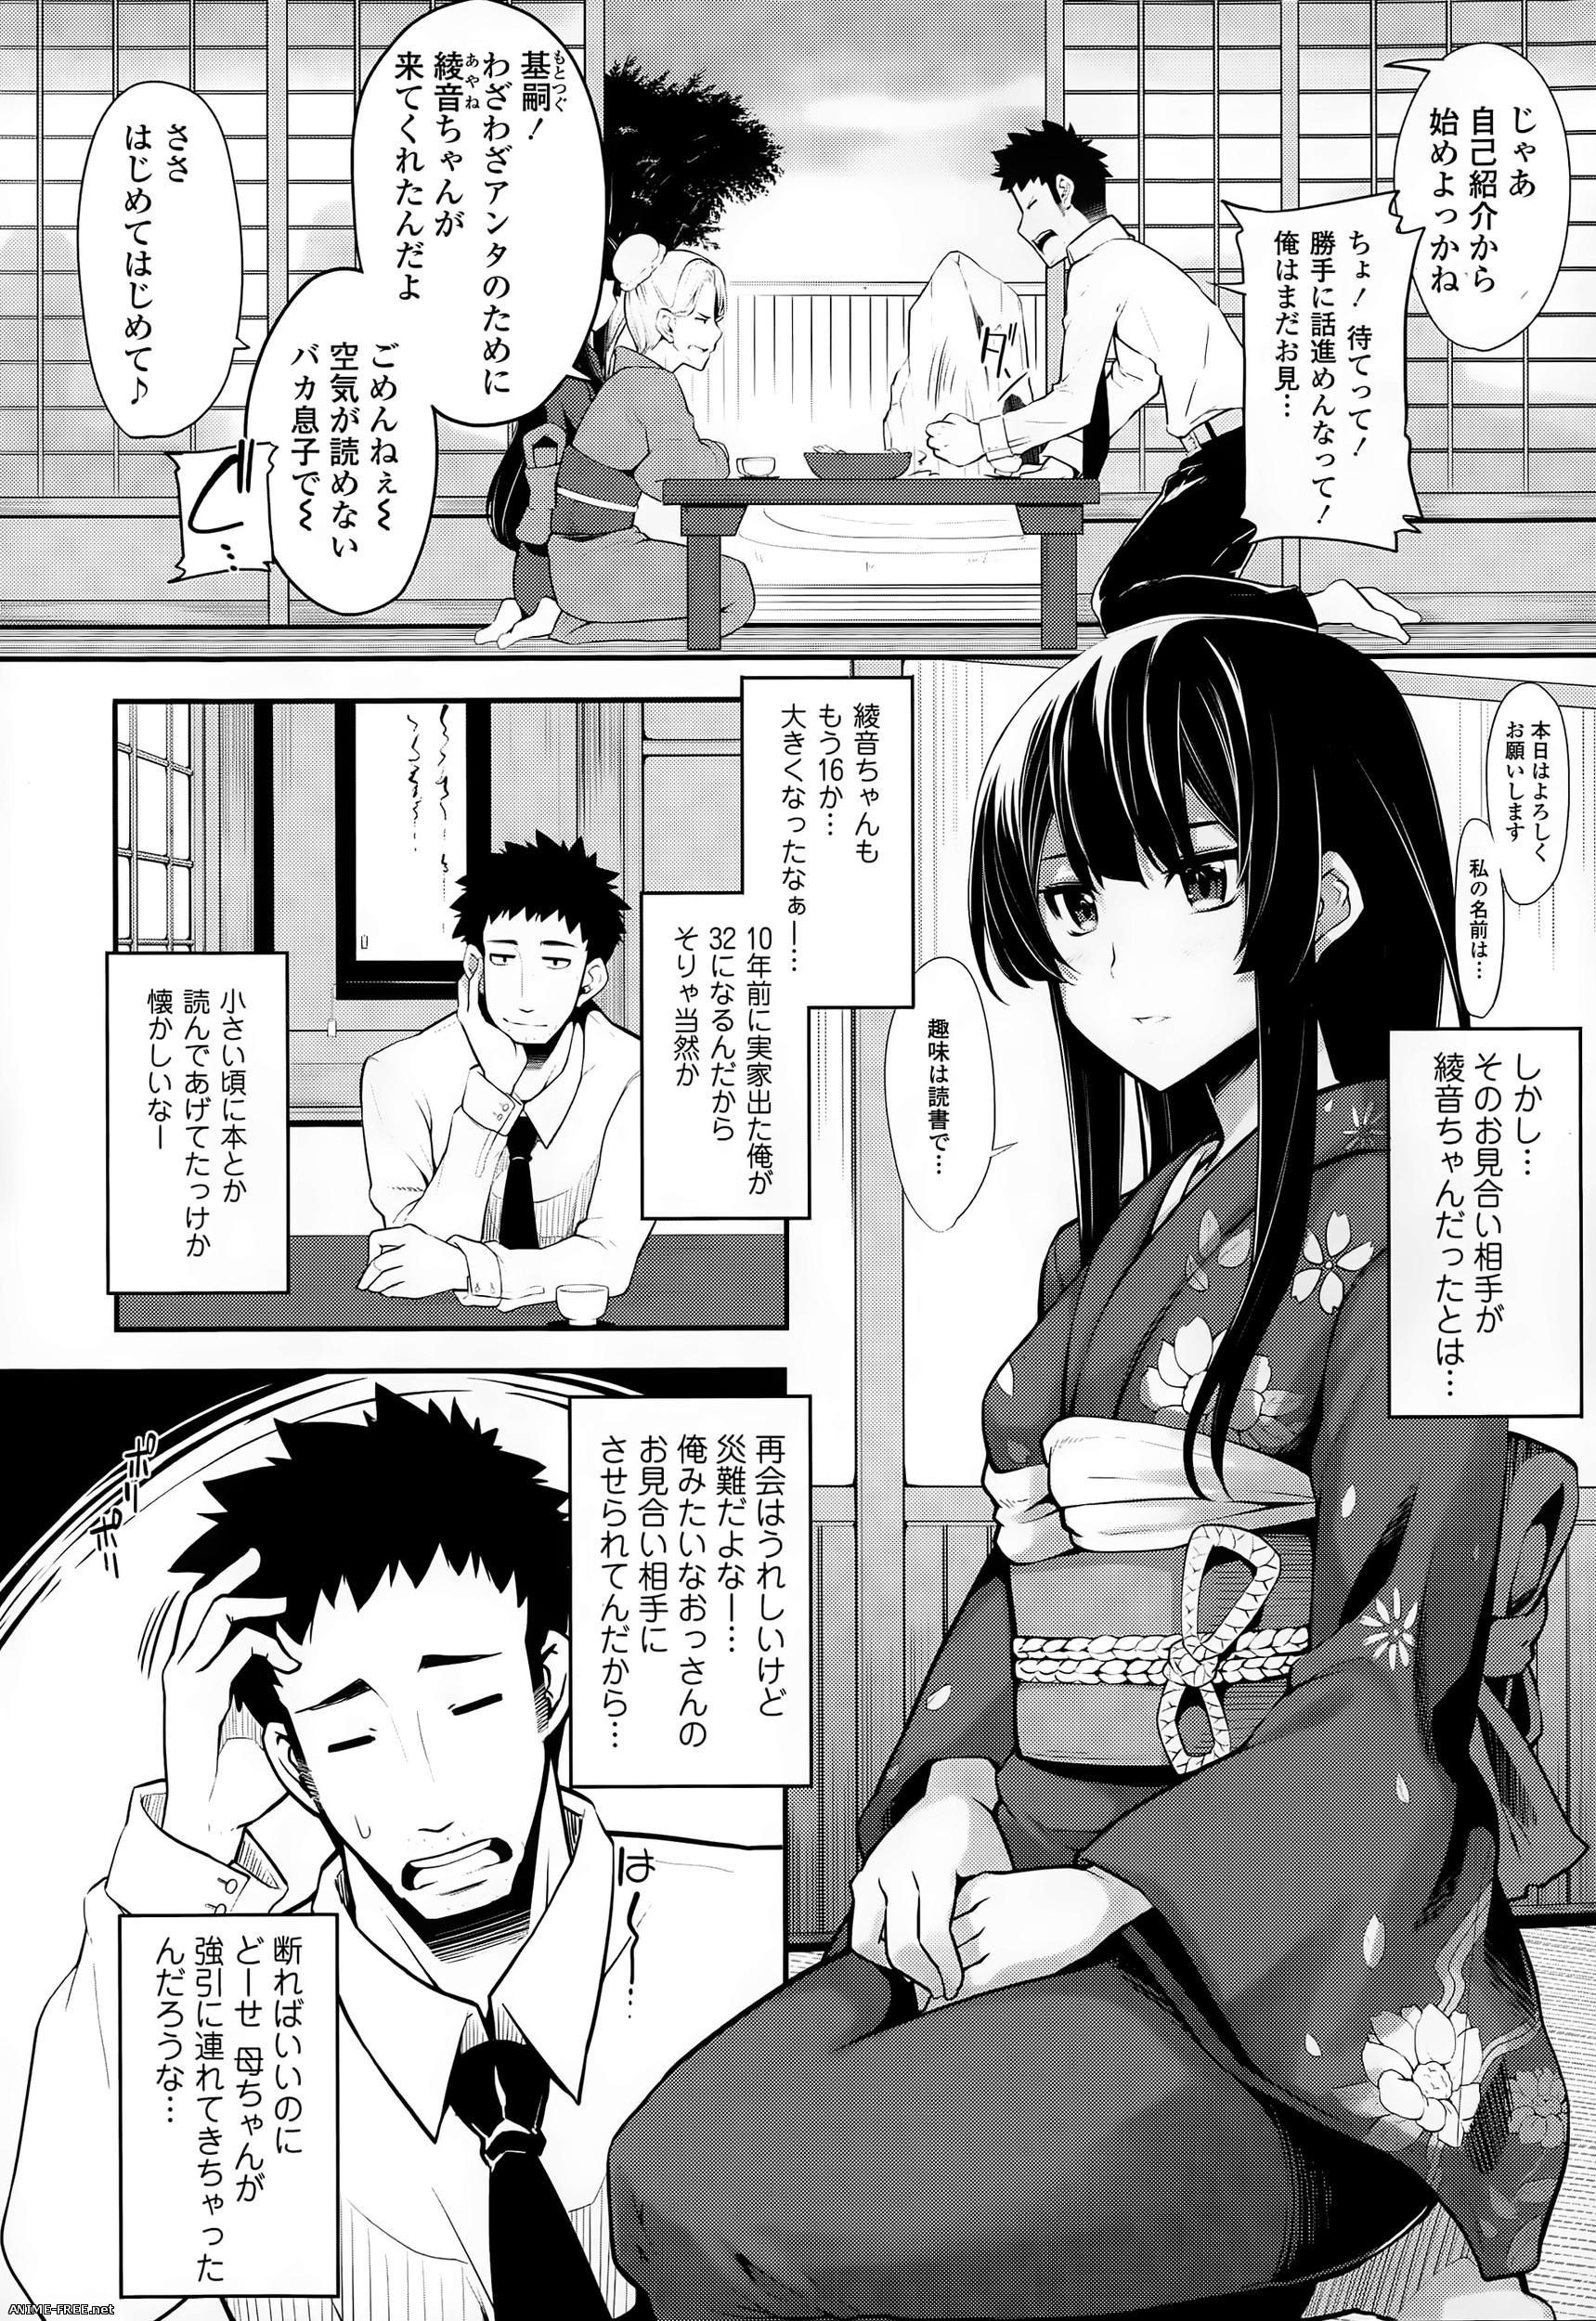 Выпуски журнала COMIC Tenma [2015] [Cen] [JAP] Manga Hentai